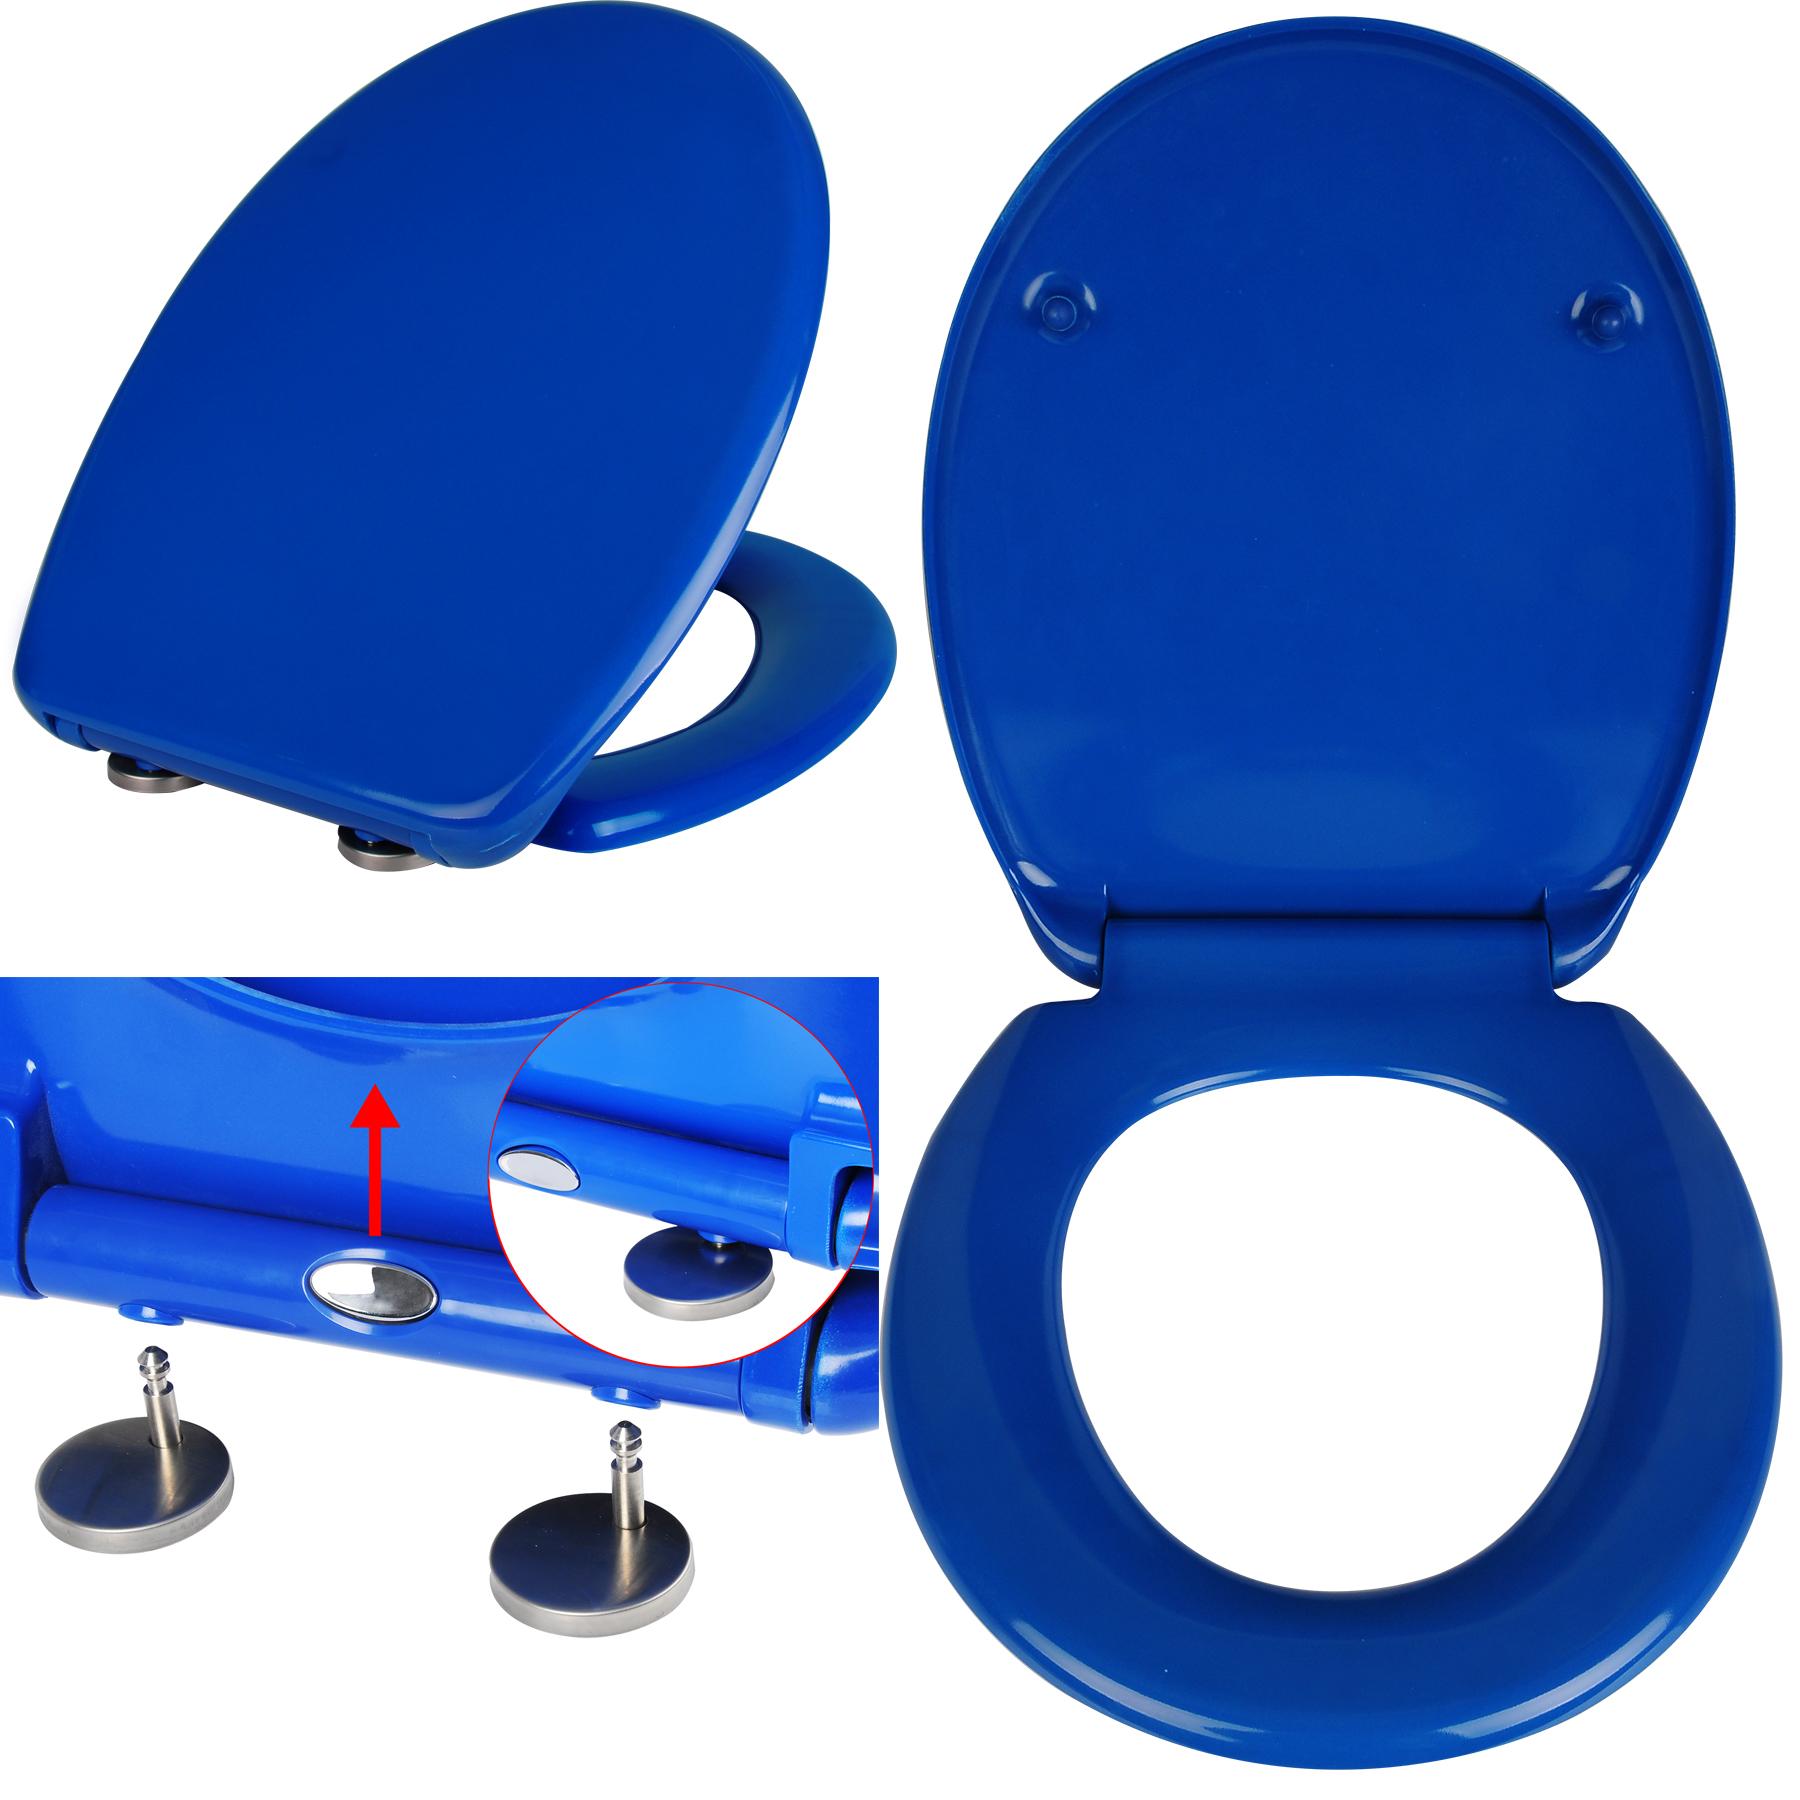 toilettensitz toilettendeckel wc sitz duroplast absenkautomatik klodeckel ws2597 ebay. Black Bedroom Furniture Sets. Home Design Ideas